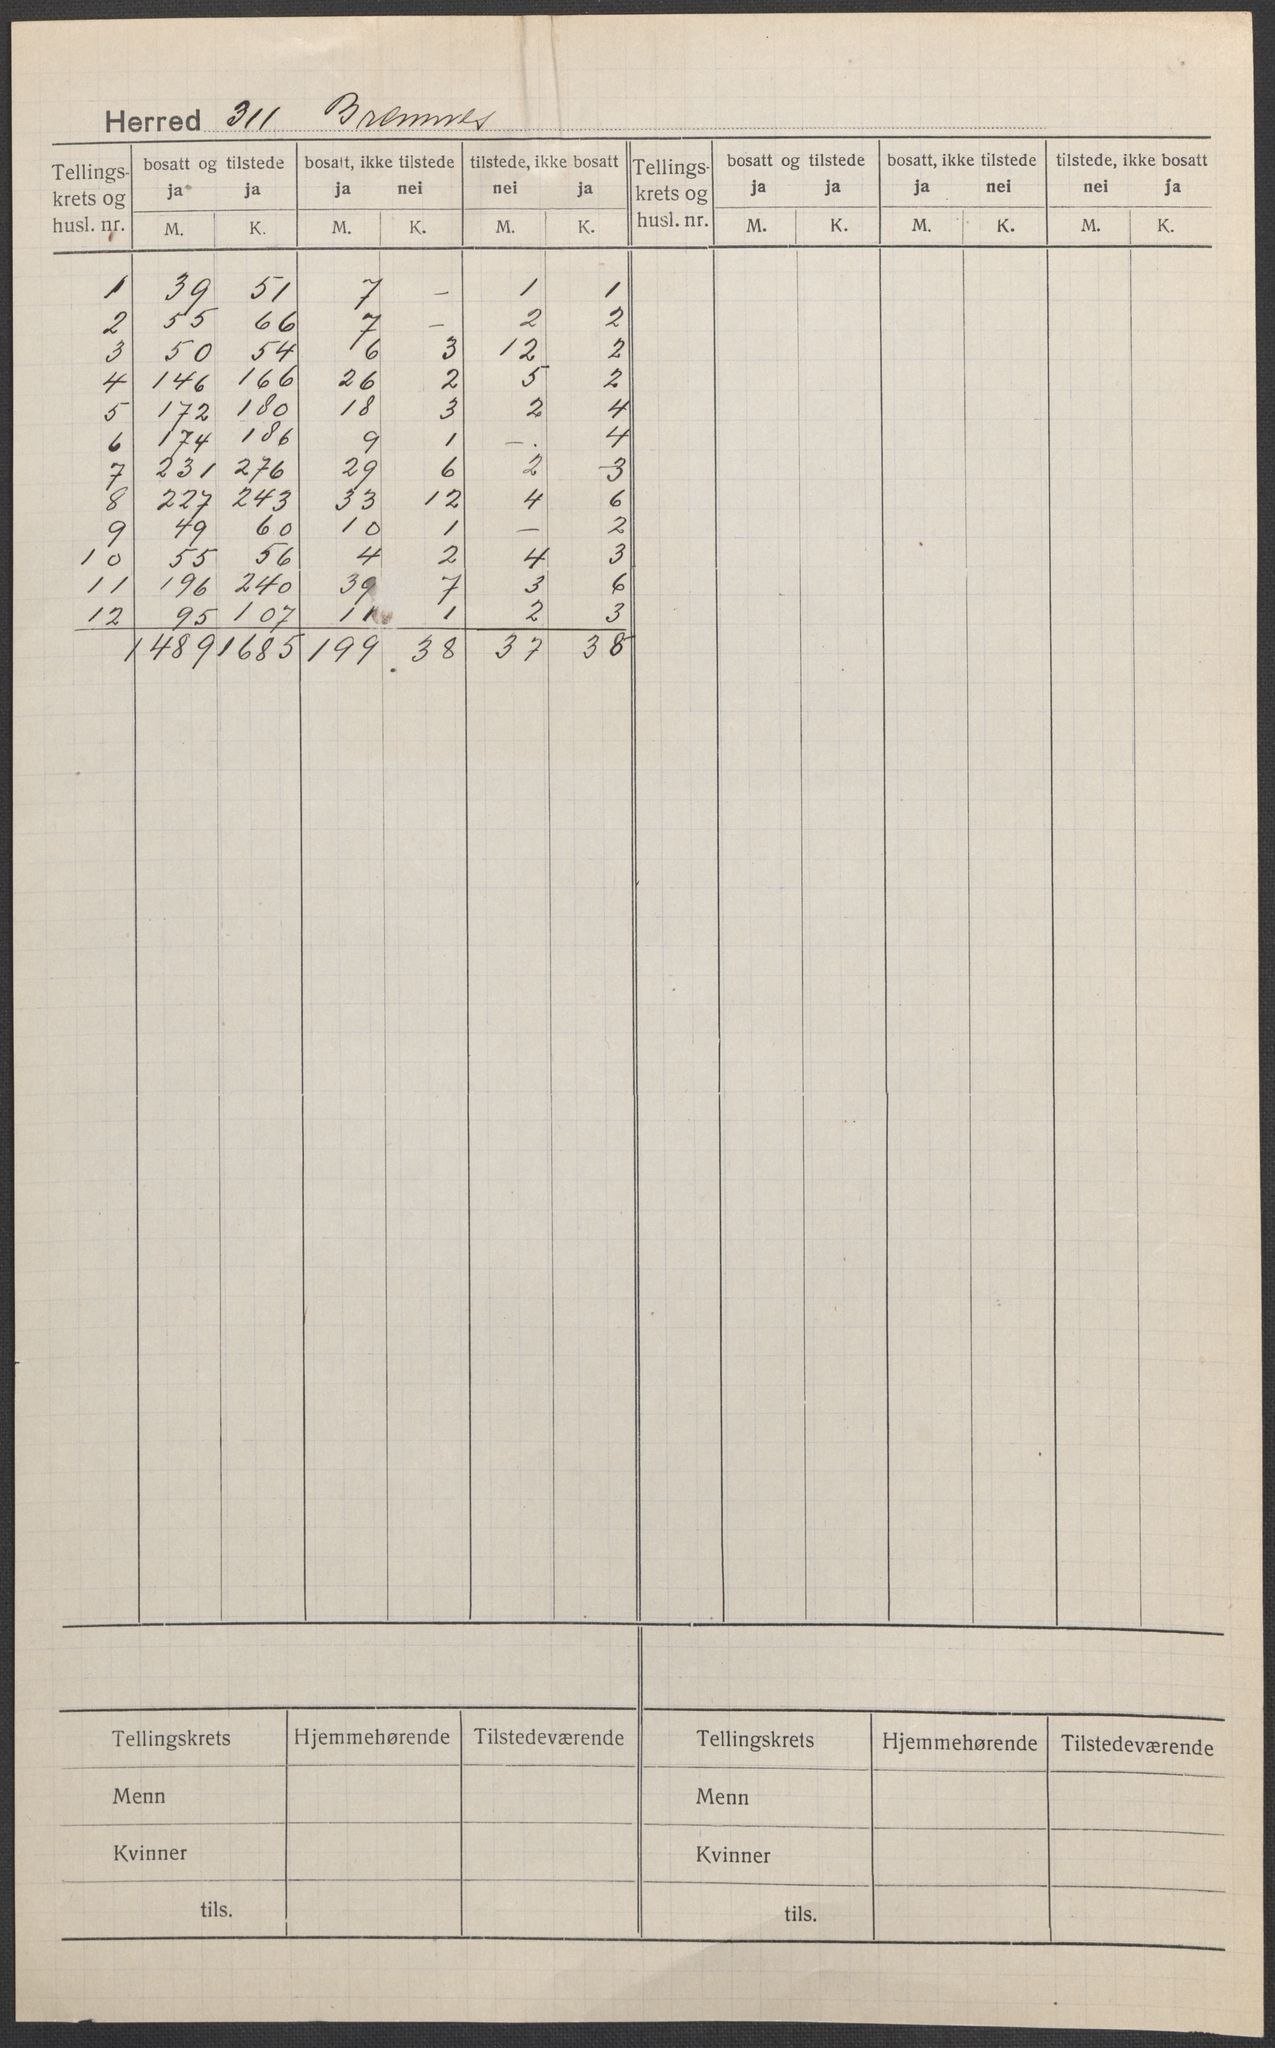 SAB, Folketelling 1920 for 1220 Bremnes herred, 1920, s. 1